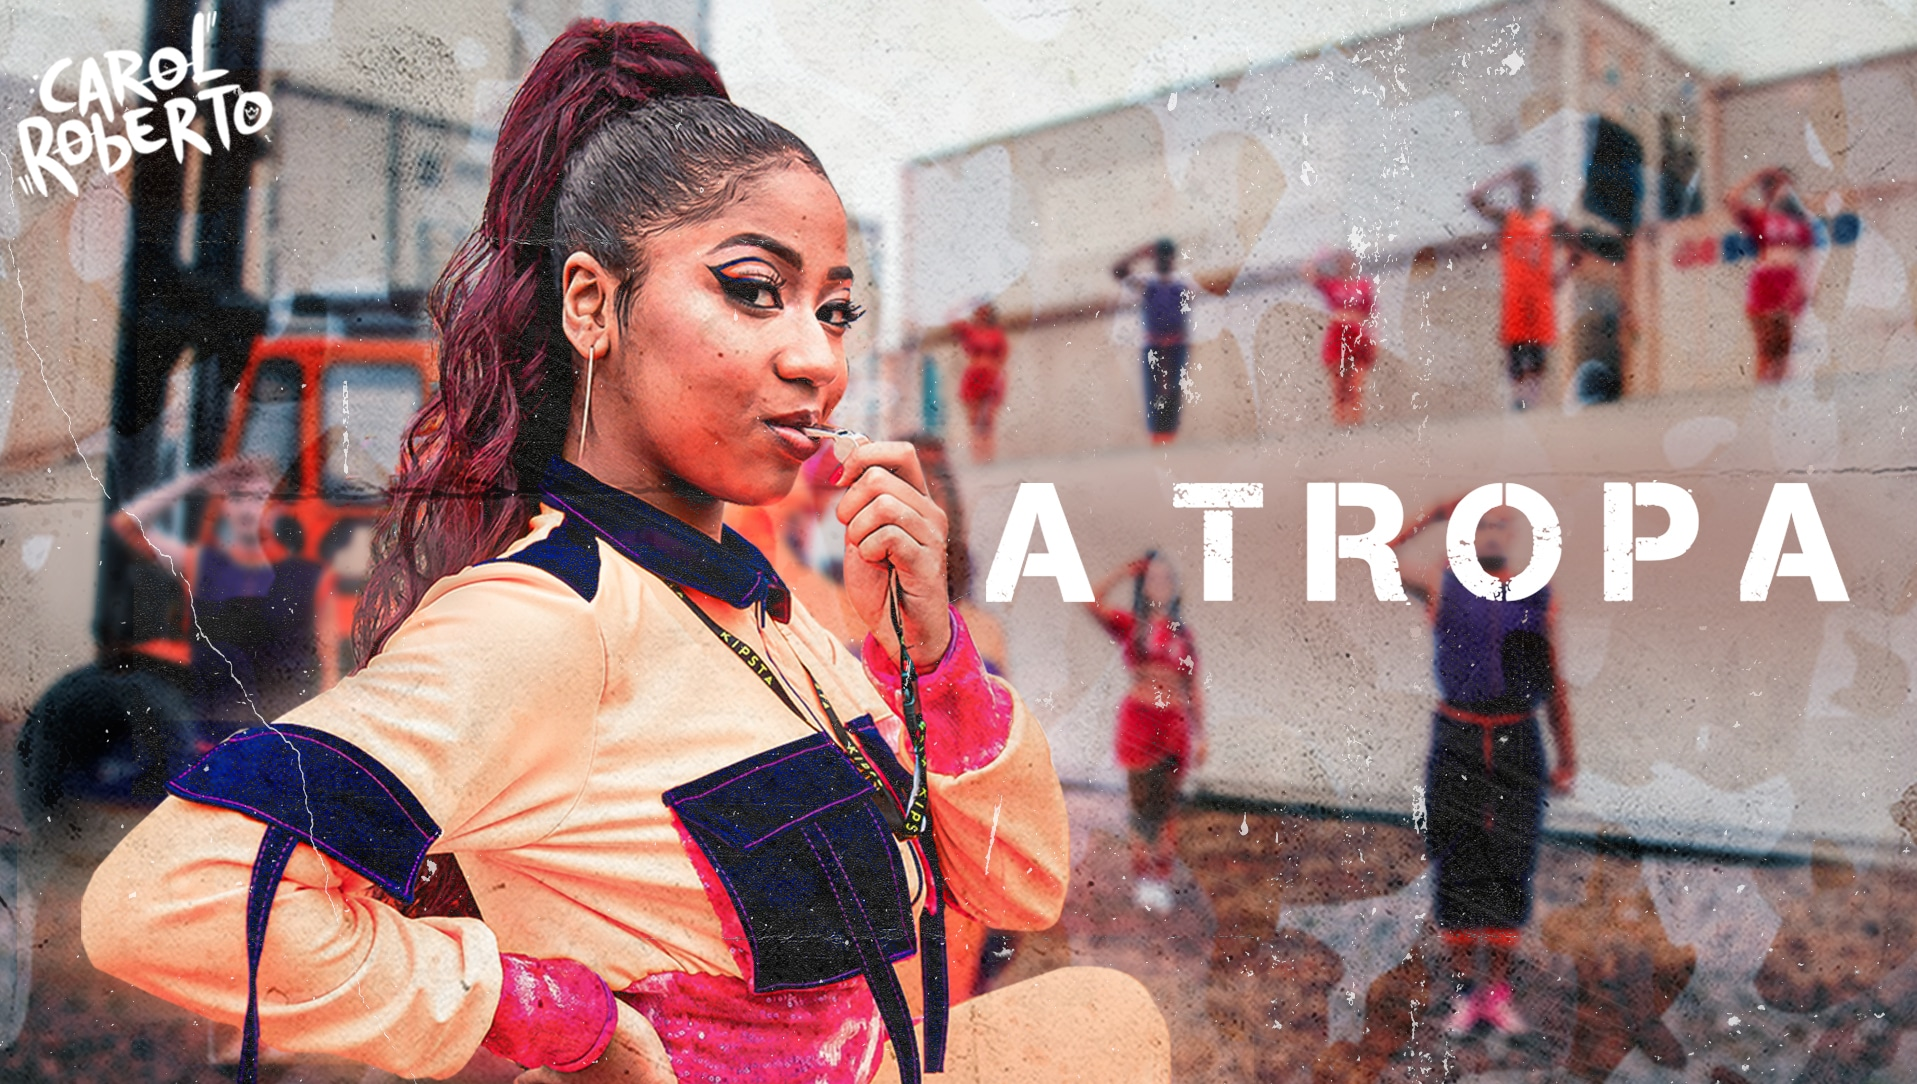 Cantora teen Carol Roberto lança videoclipe e música 'A Tropa'